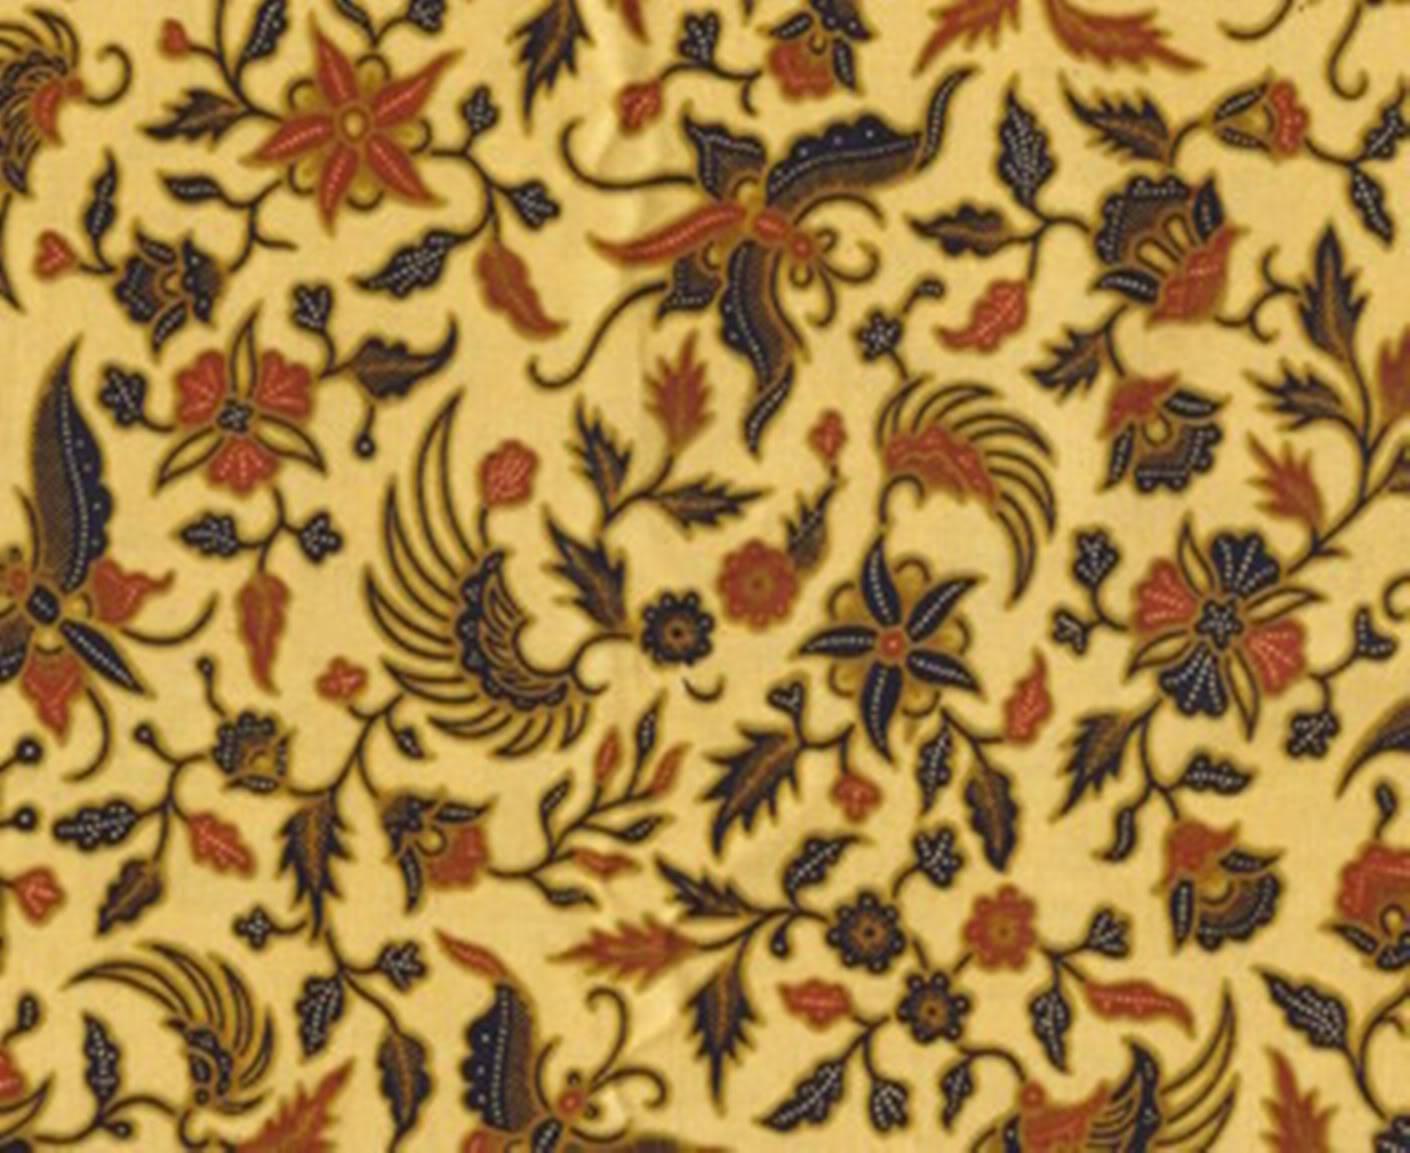 Informasi Fashion & Batik: Ciri Khas Batik Pekalongan